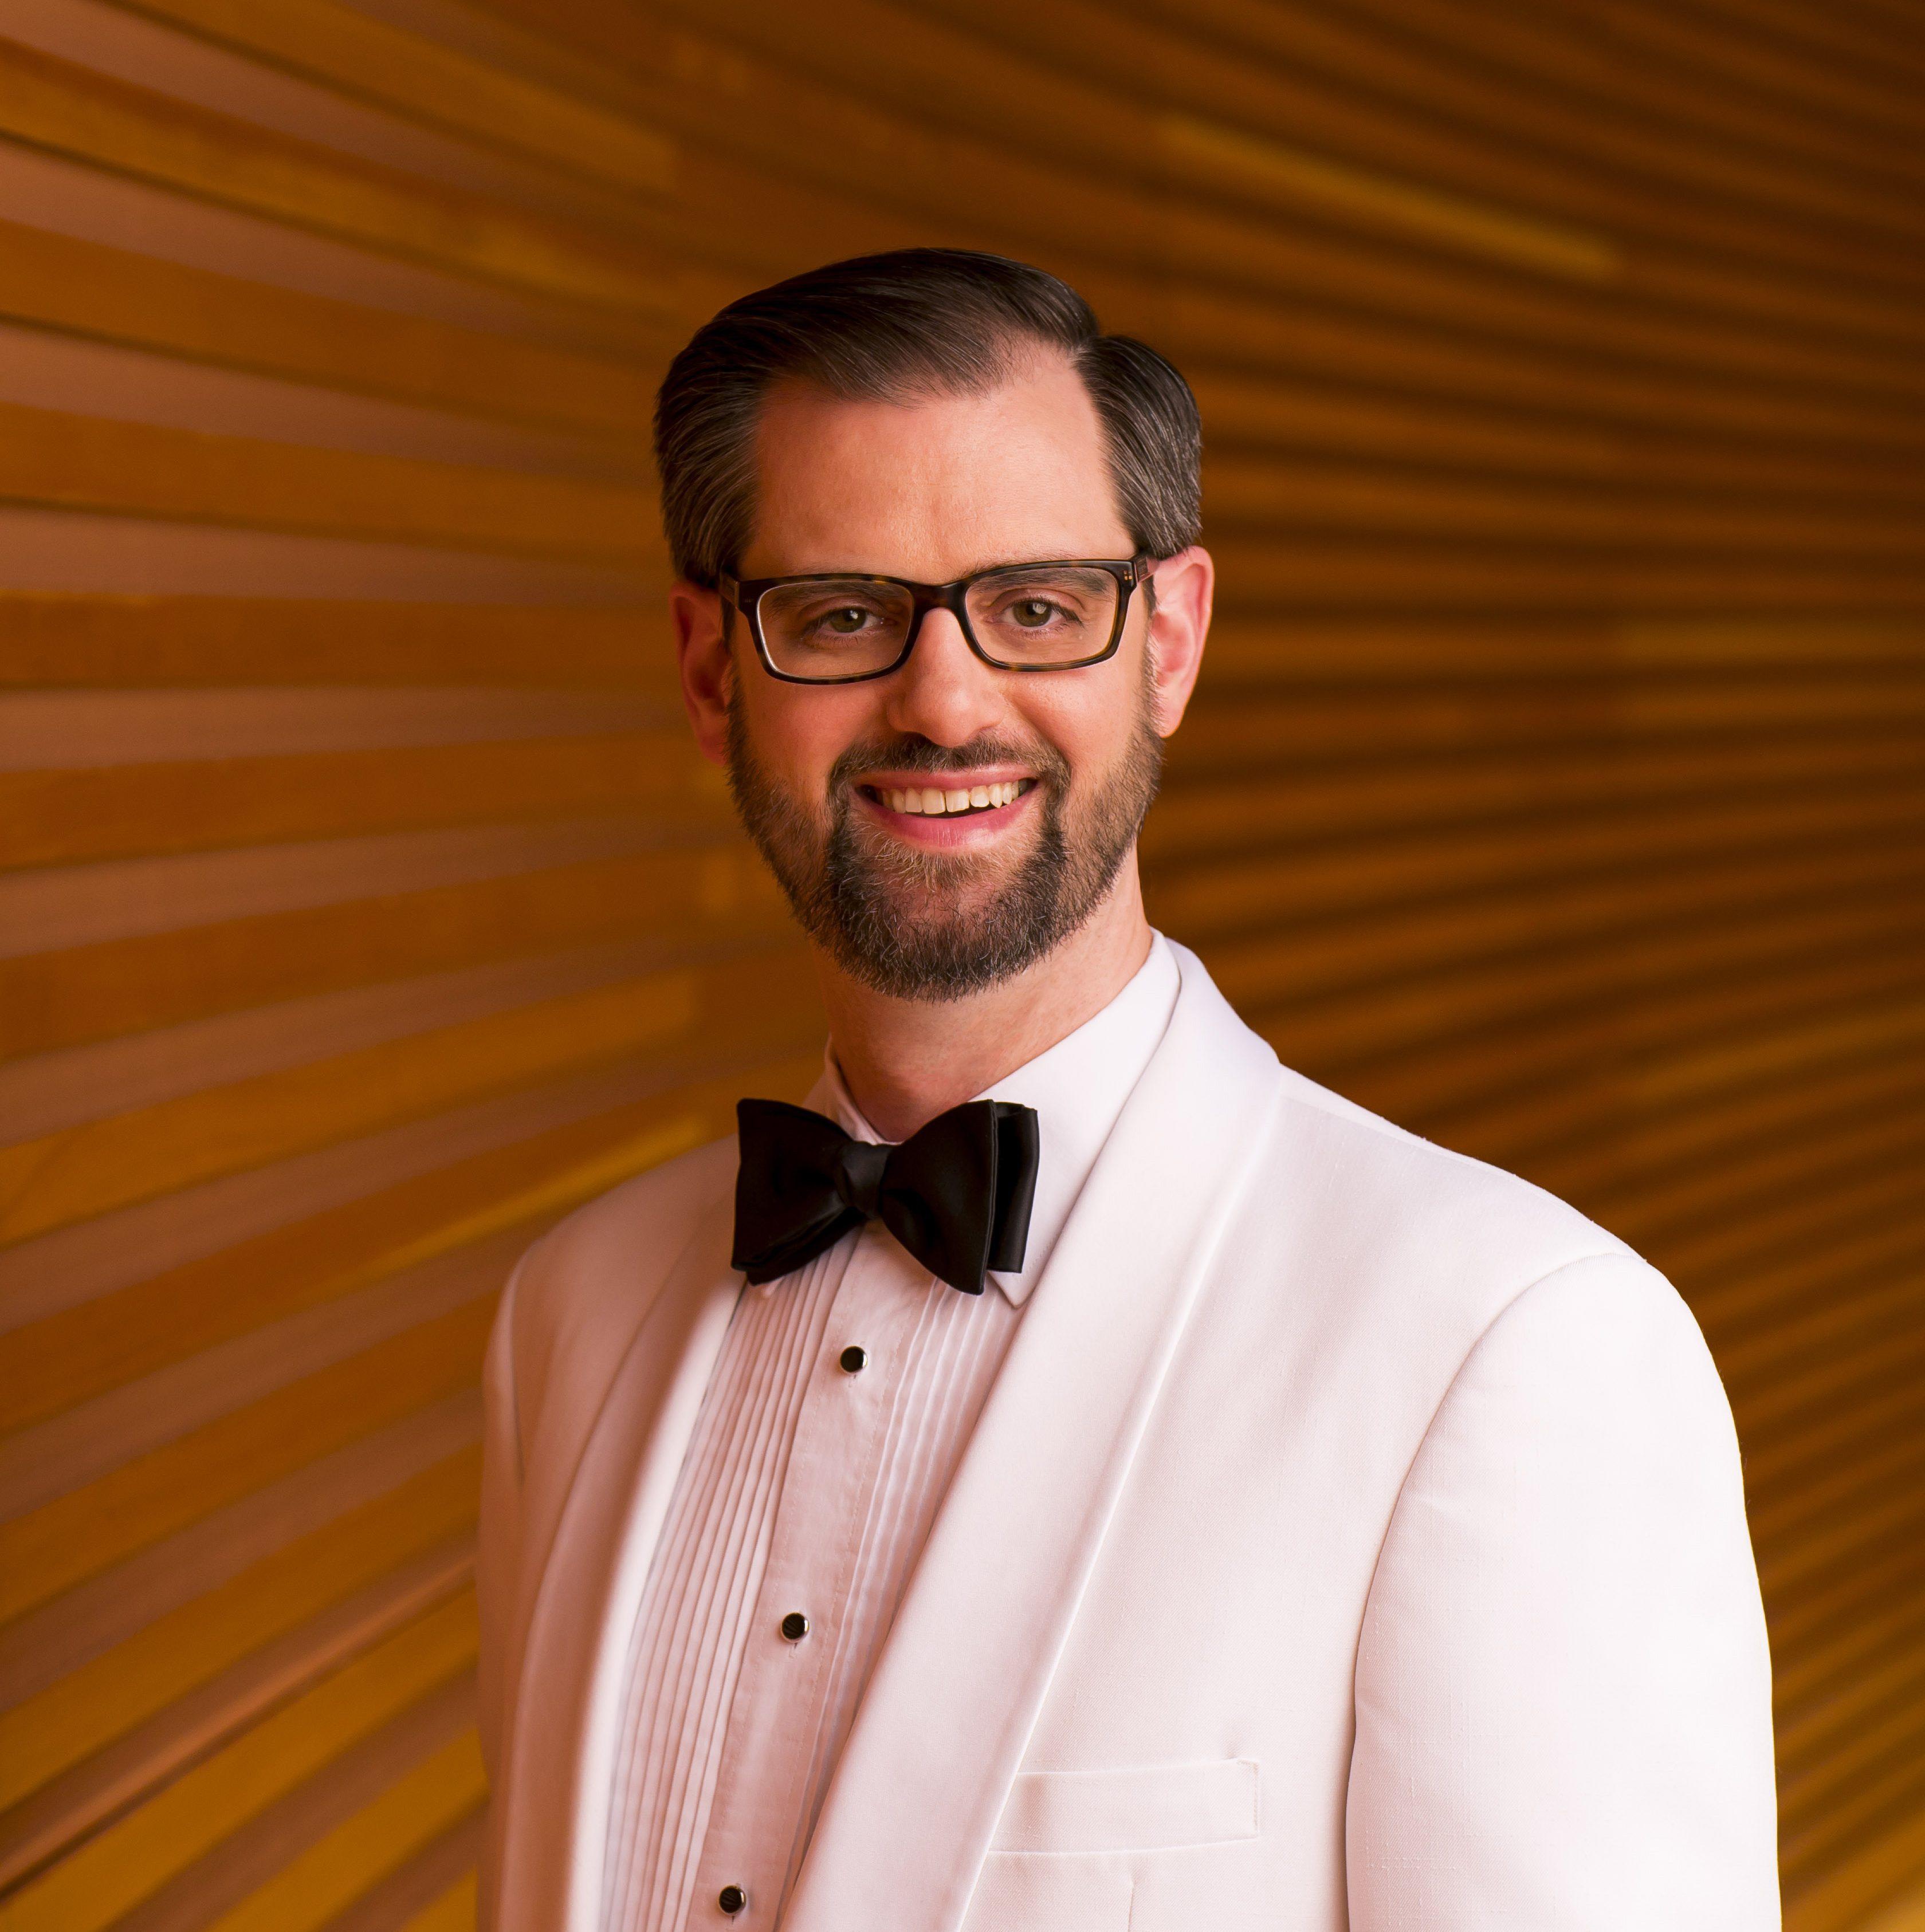 6/17/17 1:07:45 PM   The Kansas City Symphony Portraits: David T. Beals III Assistant Conductor Jason Seber ©Todd Rosenberg Photography 2017